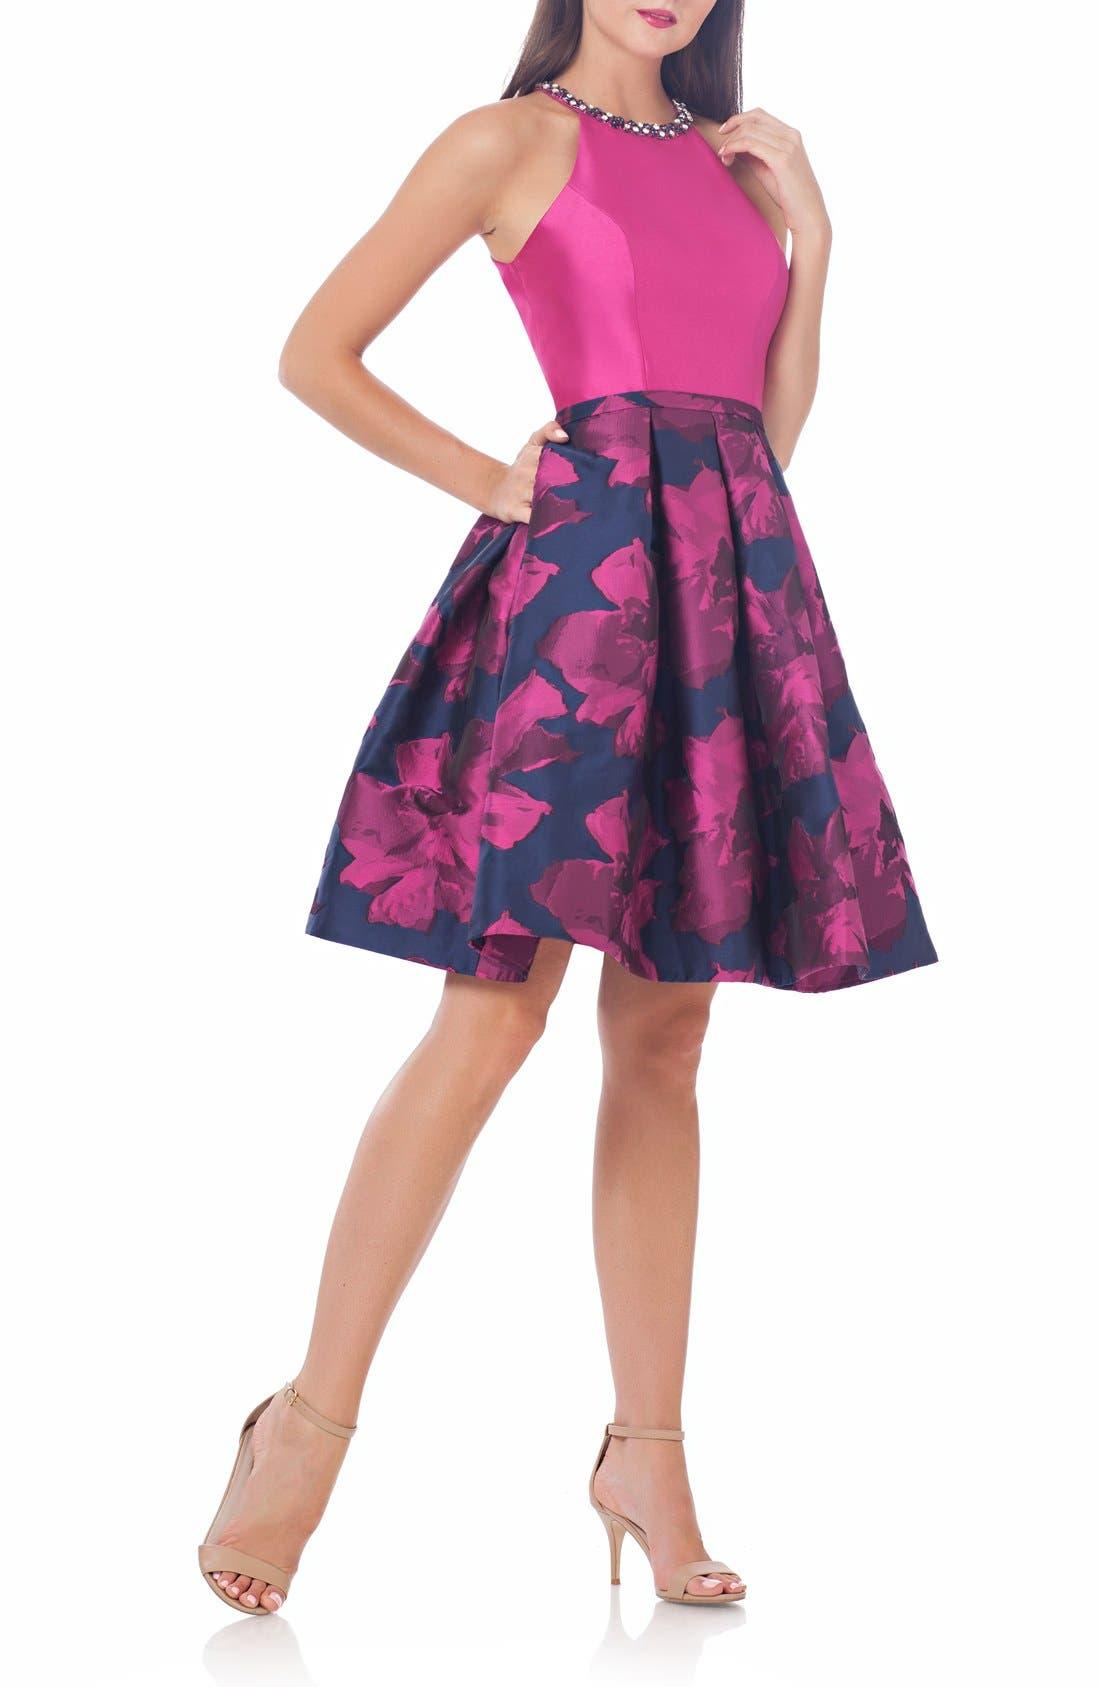 CARMEN MARC VALVO INFUSION Fit & Flare Dress